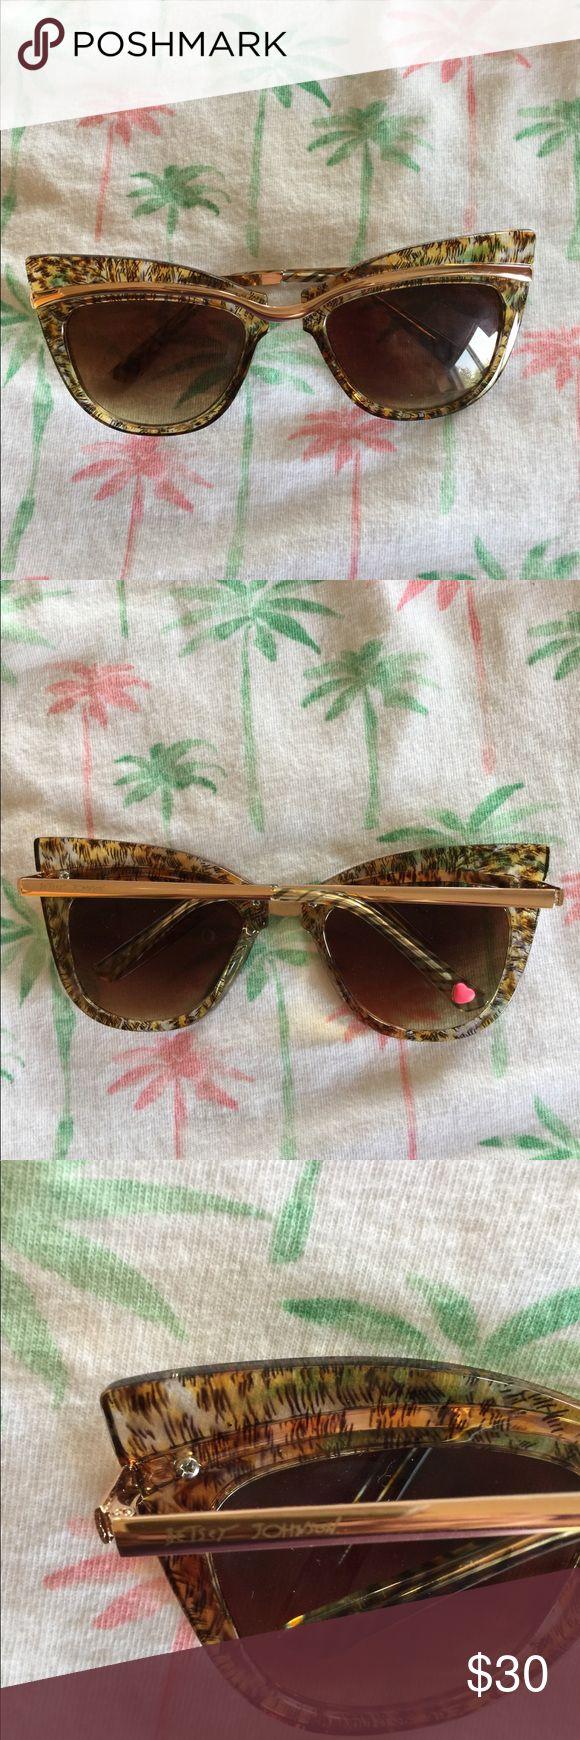 050e97b3f6a1 Betsey Johnson Animal Print Wayfarer Sunglasses « One More Soul